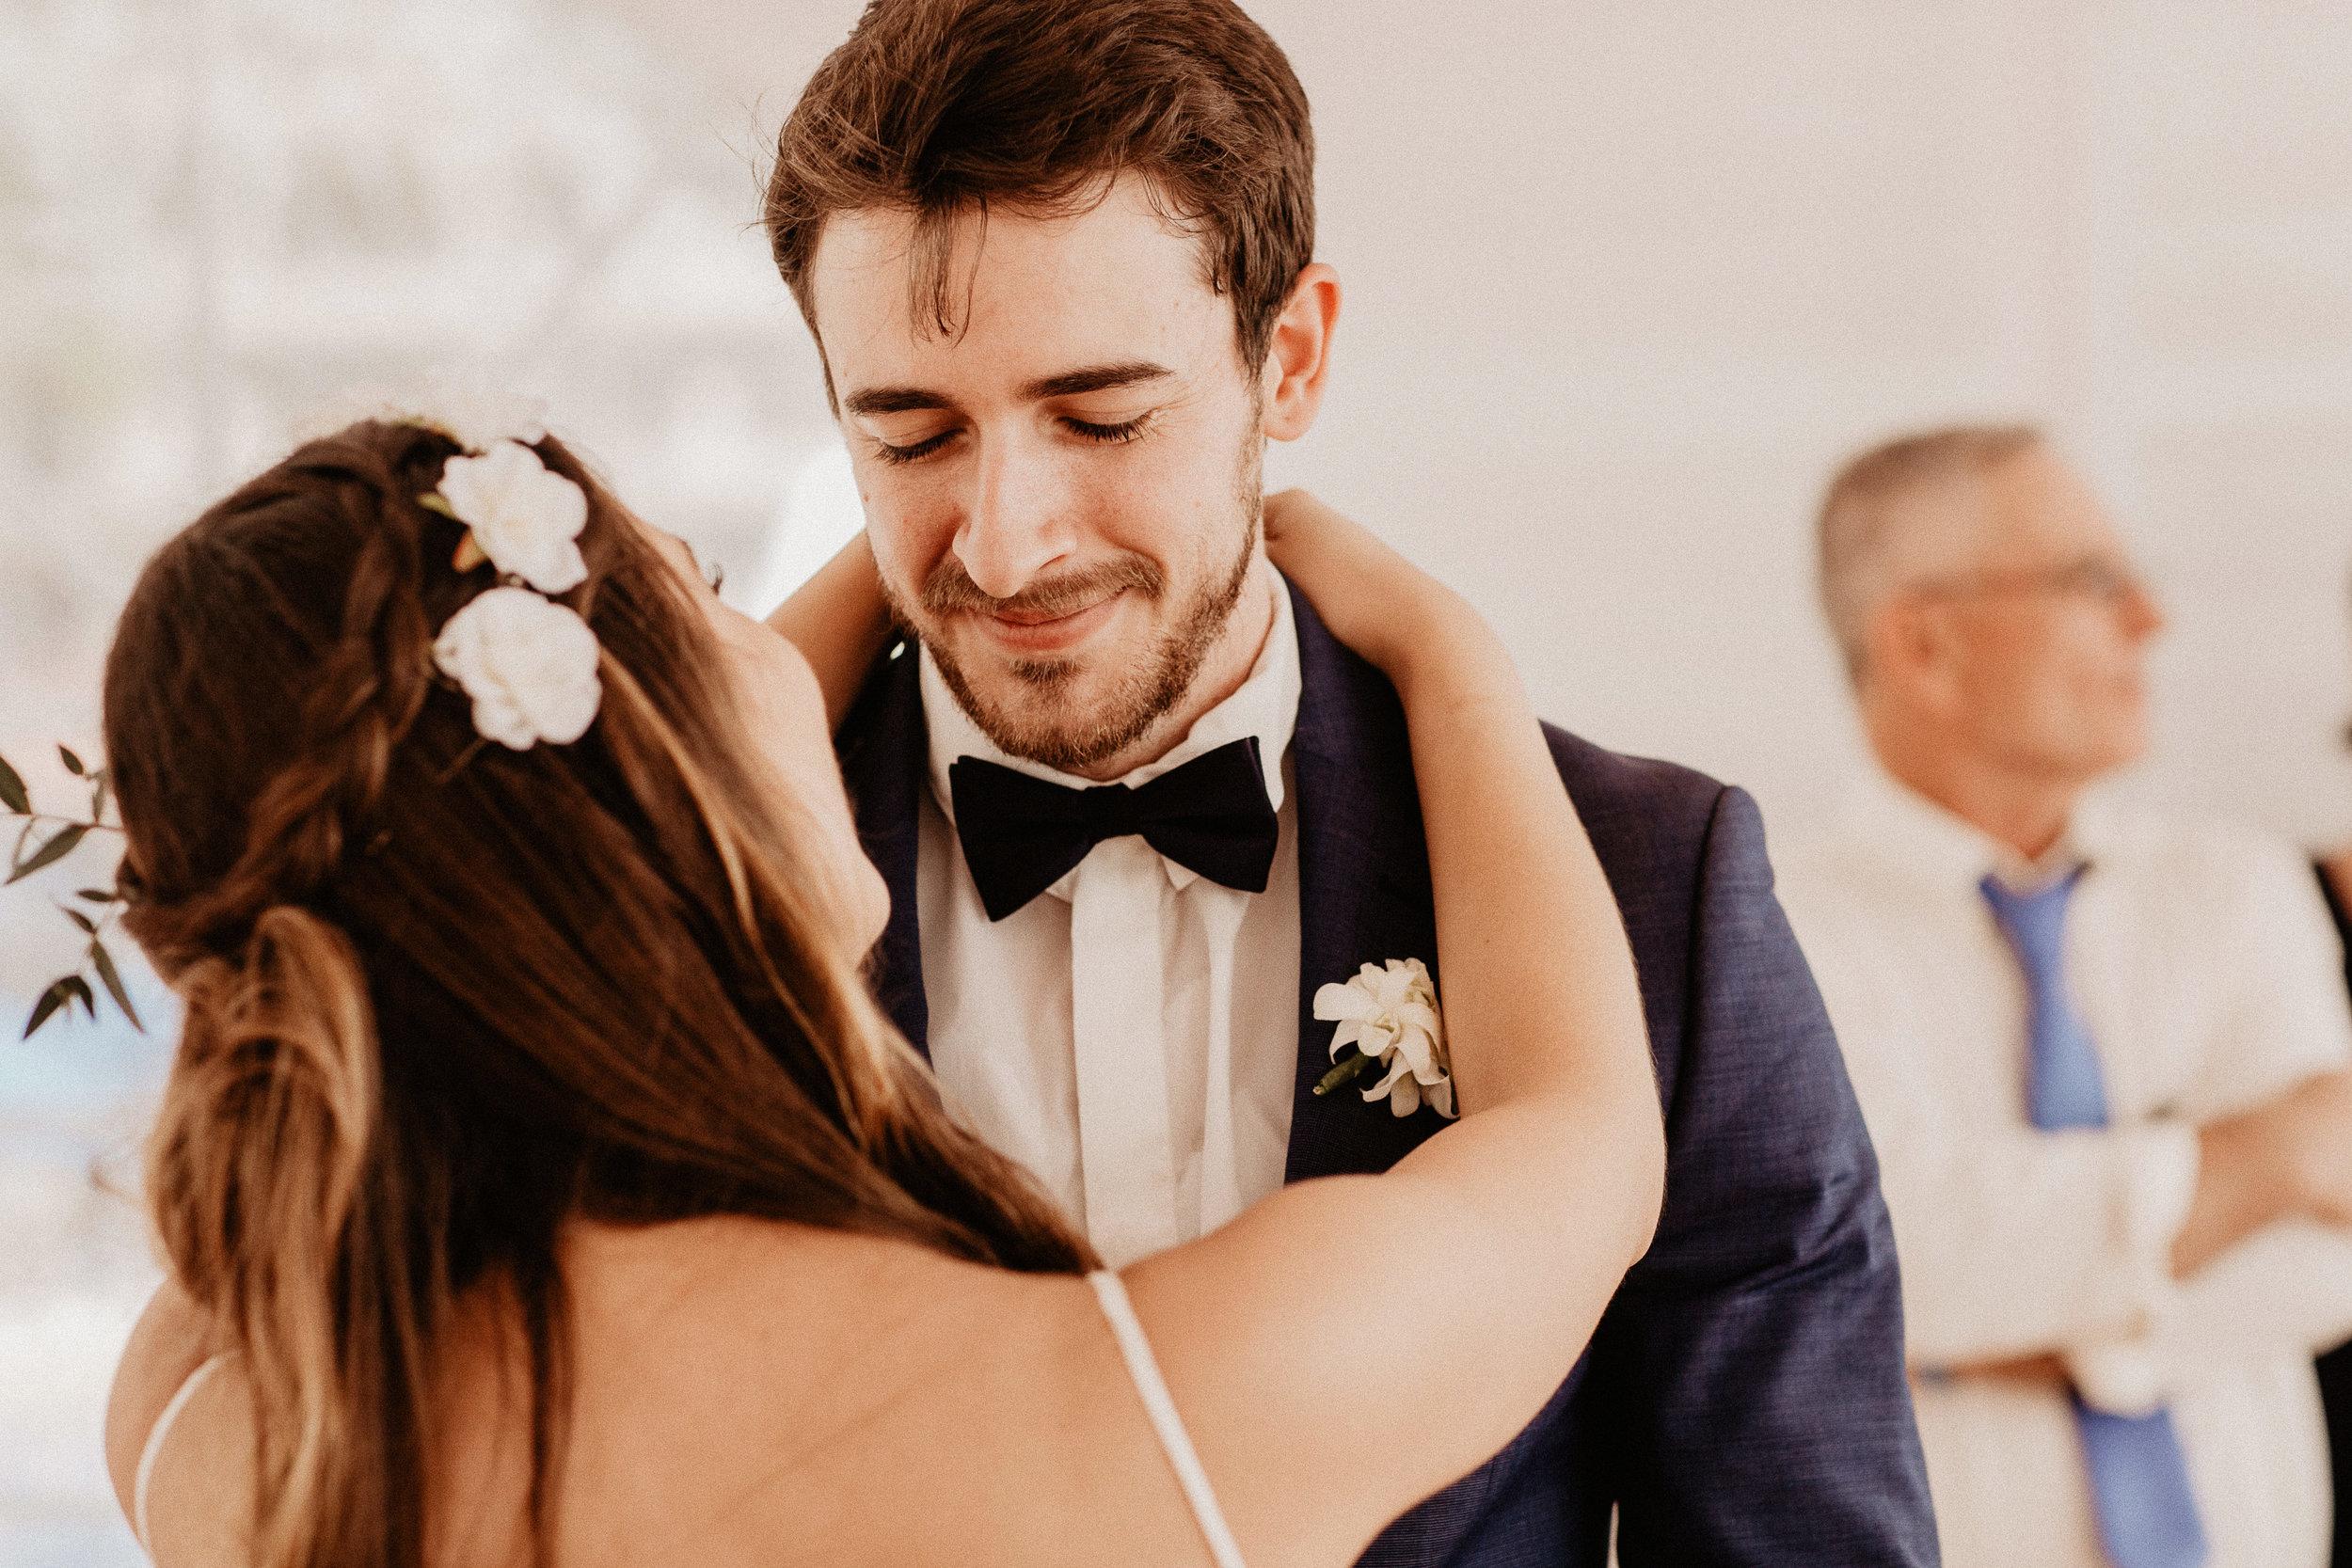 alfonso_flores_destination_wedding_photography_puerto_vallarta_hotel_barcelo_vallarta_cuttler_amela-465.JPG